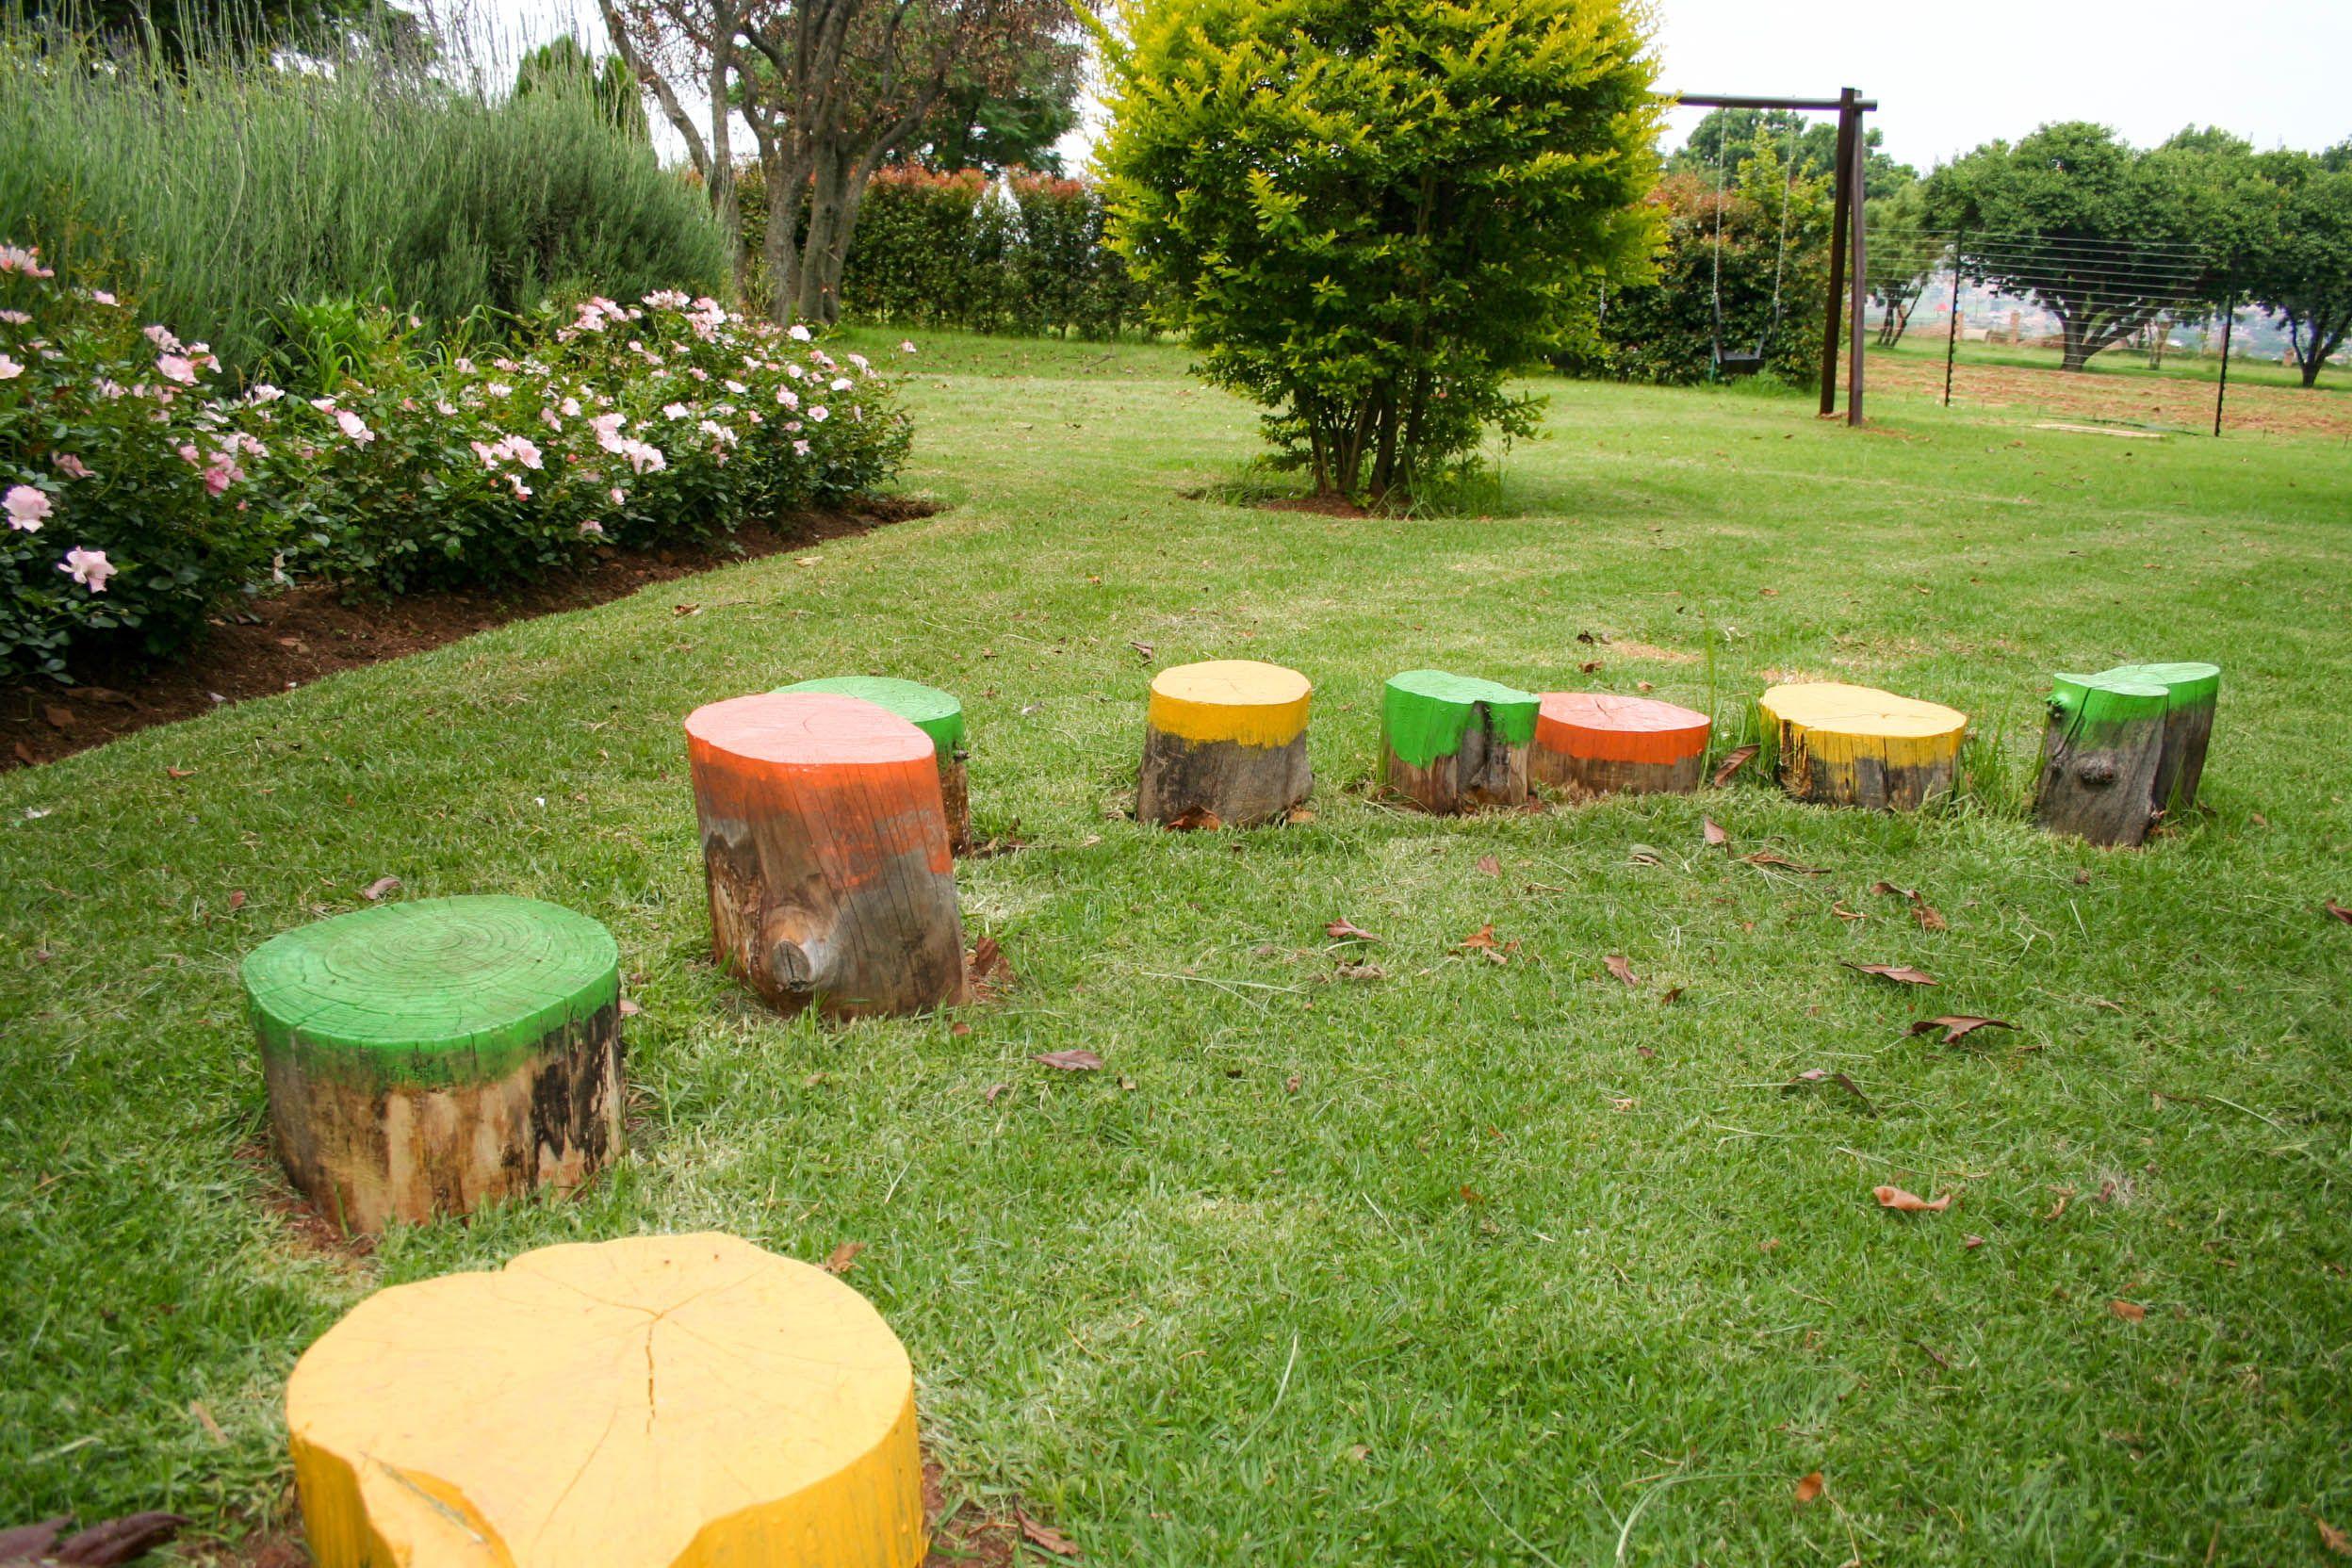 Natural Playground: Tree stumps for balancing | Natural ... on natural sandbox ideas, natural playground with tree stumps, natural playground design, natural play ground ideas, natural home playground, natural playground treehouse, natural playhouse ideas,